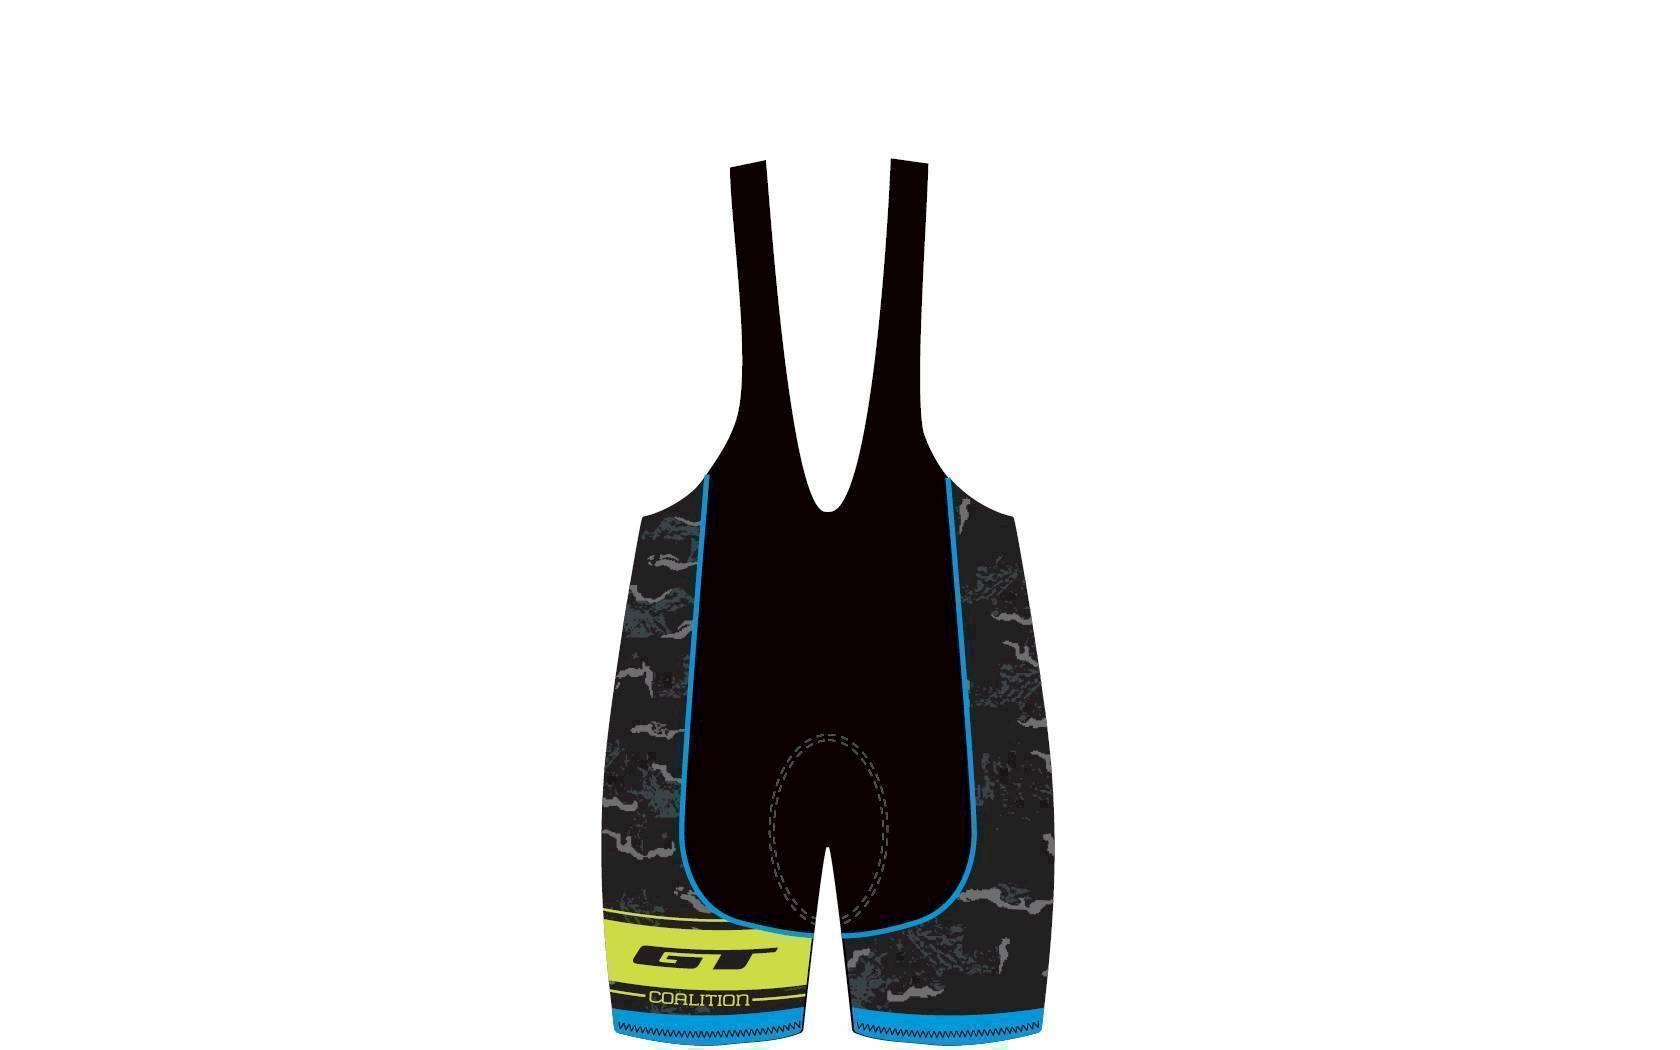 2017 GT KRAŤASY S LACLEM RACE, BLUE/YELLOW L